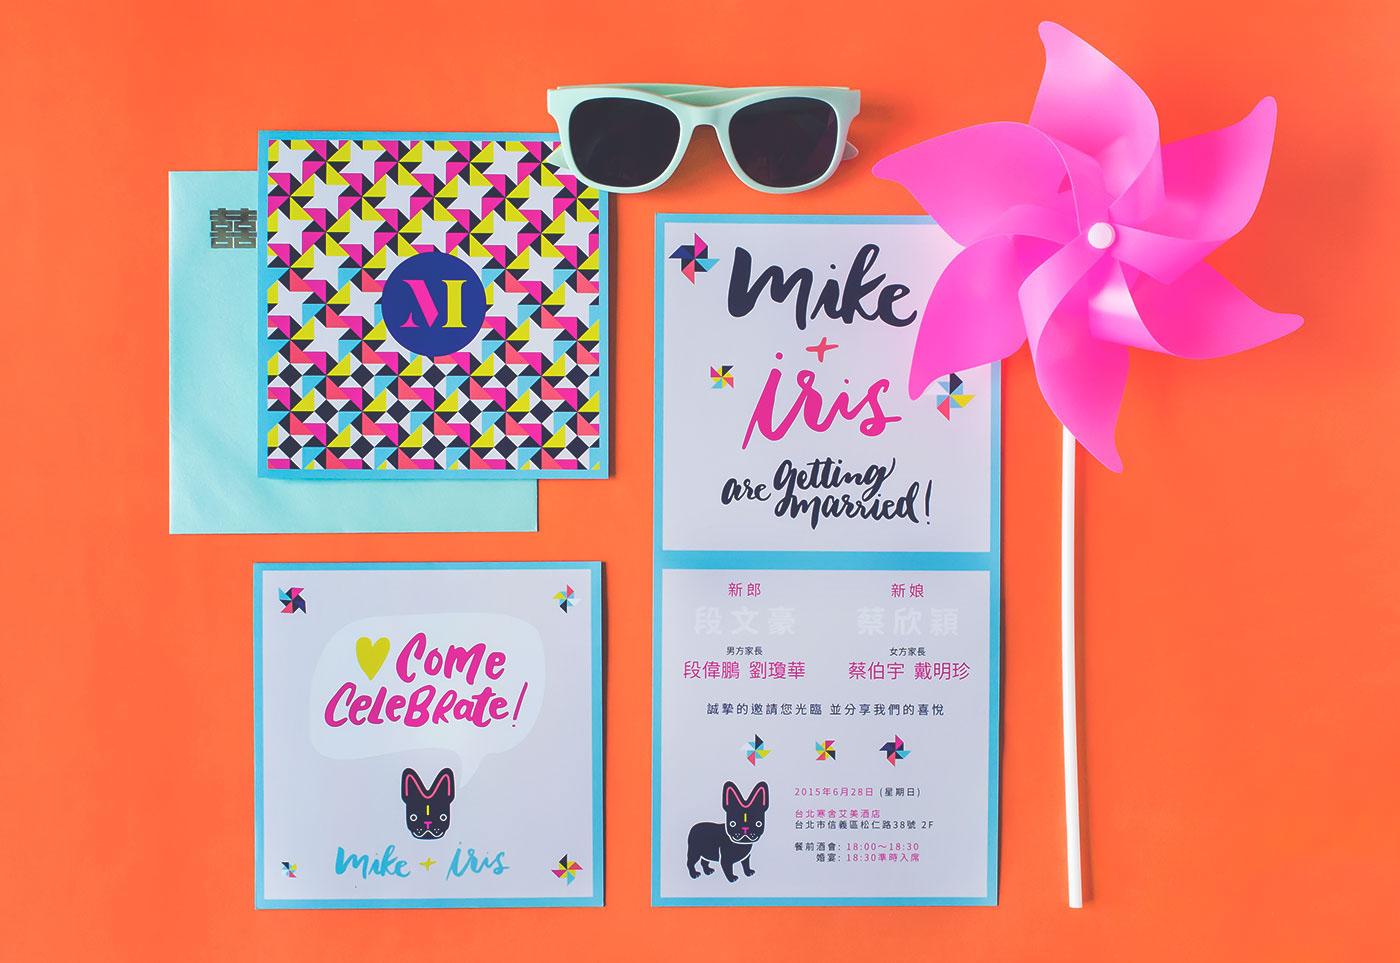 monogram Weddings wedding bulldog logos bright colors